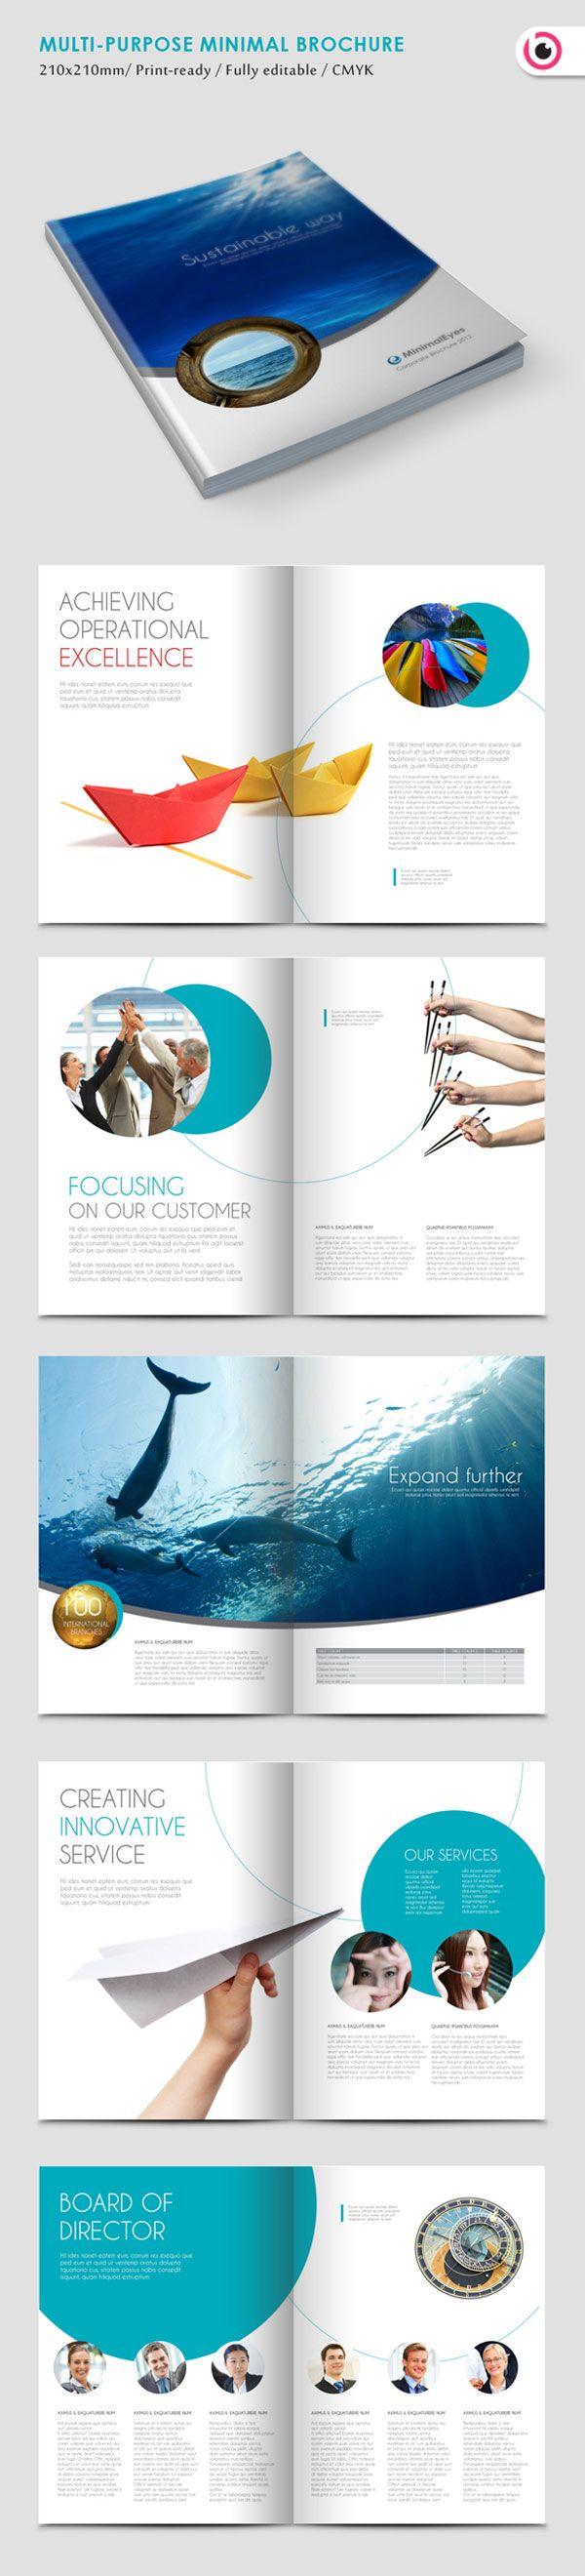 Simple Yet Beautiful Brochure Design Inspiration Templates - Beautiful brochure templates